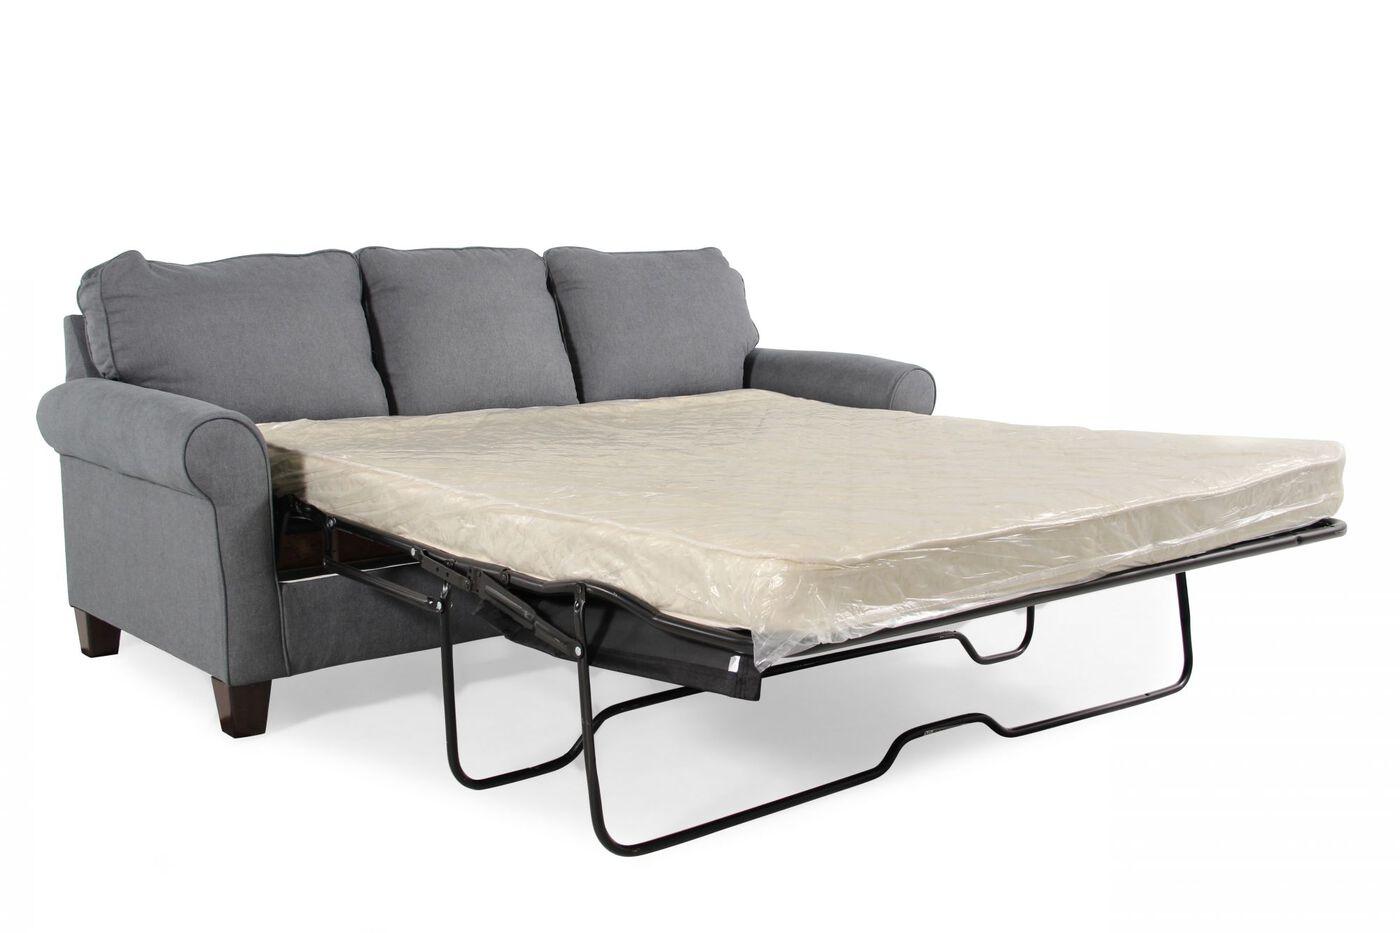 Contemporary Queen Sleeper Sofa In Denim Blue Mathis